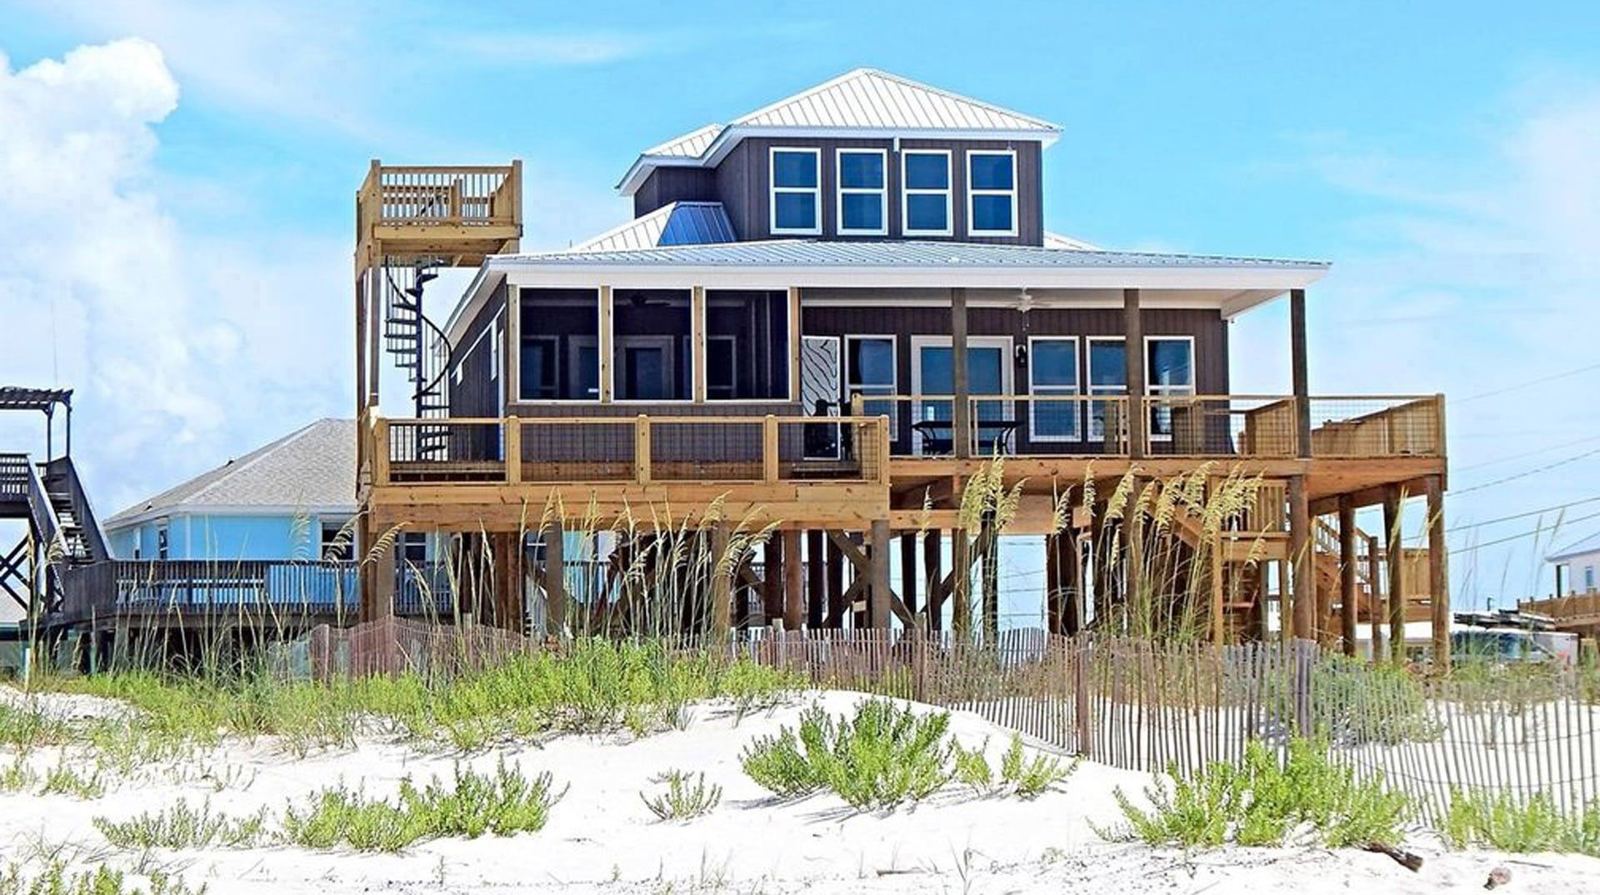 panama city beach mortgage, panama city beach mortgage rates, panama city beach mortgage broker, panama city beach mortgage lender, panama city beach mortgage company, panama city beach mortgage calculator,